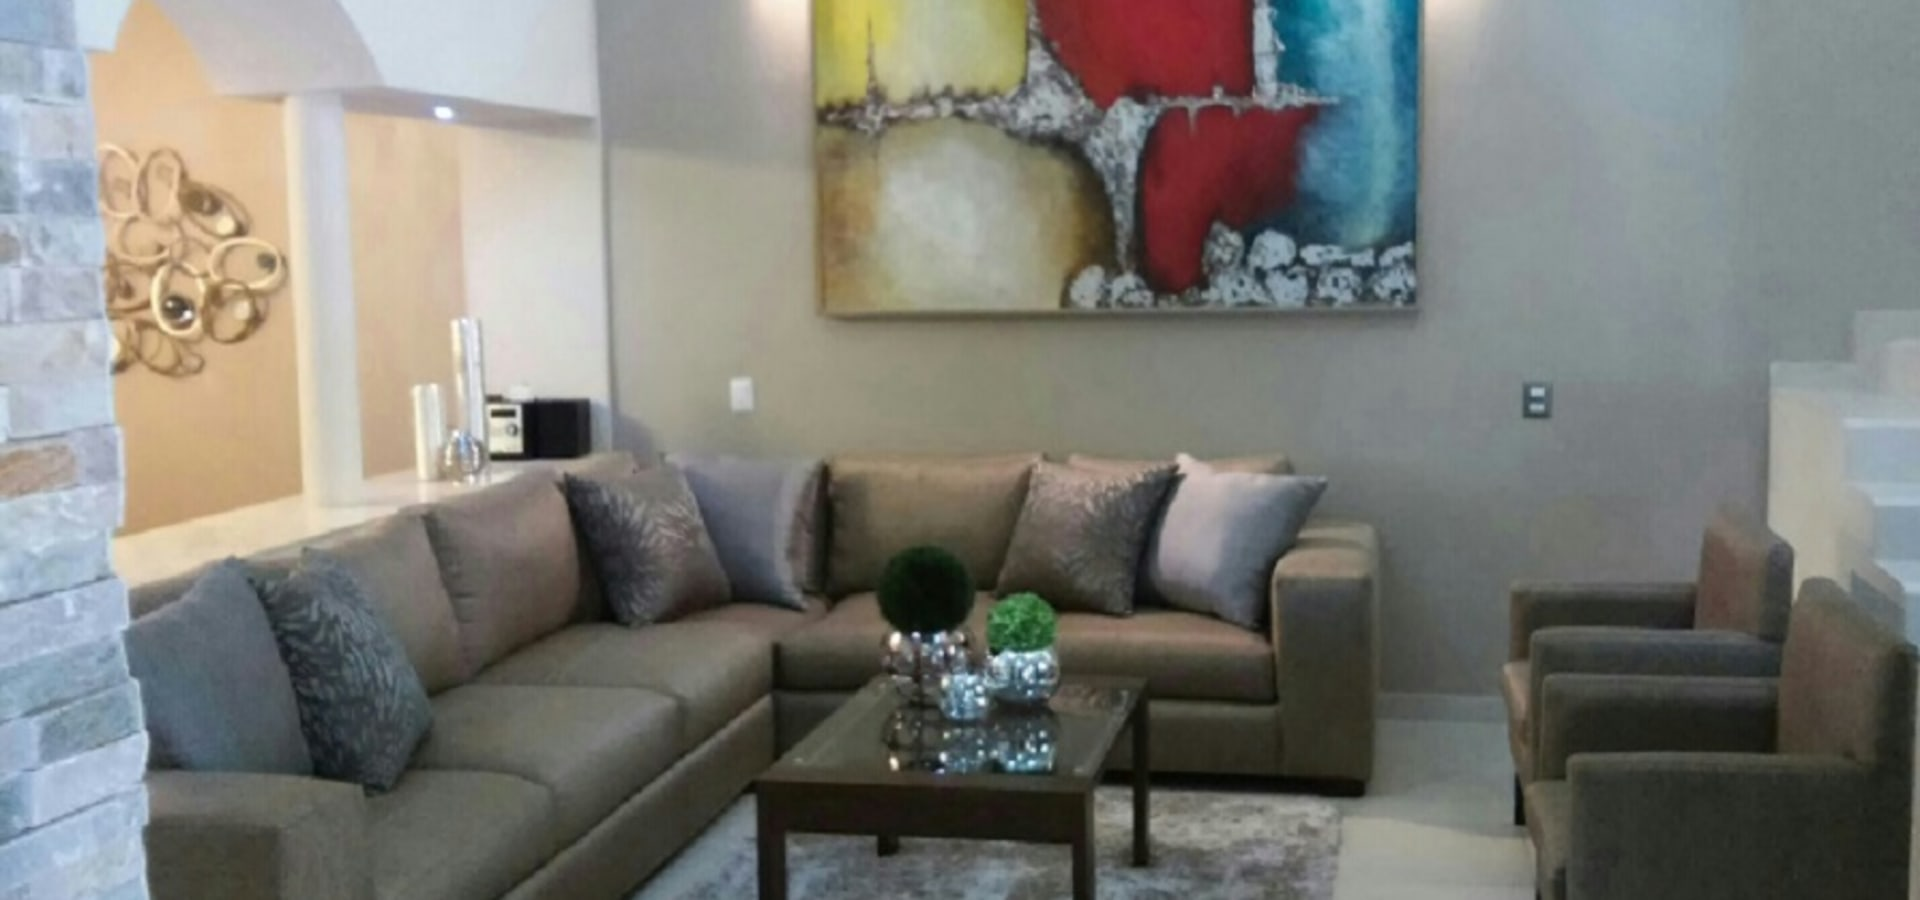 Donatello interiores sala estilo mexicano for Salas estilo mexicano contemporaneo